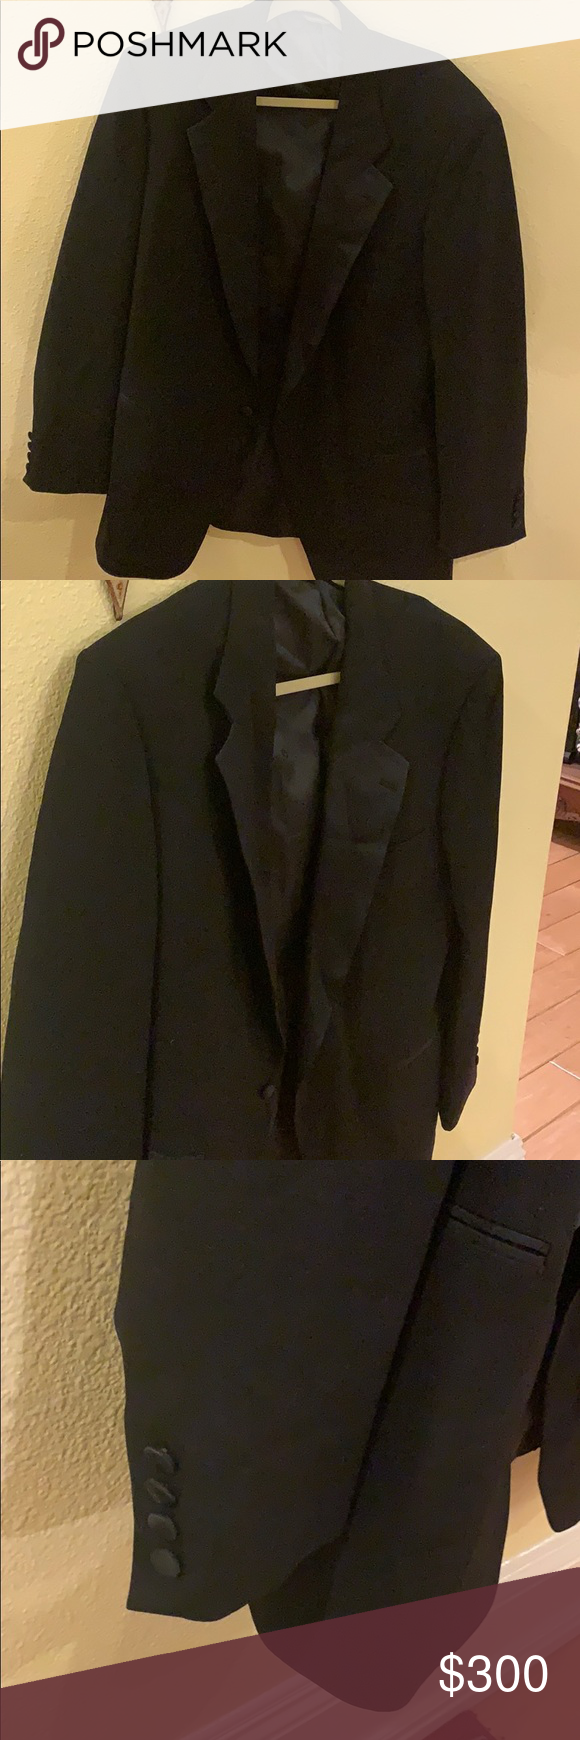 Jacket Dress Black Ladies H M Us Jacket Dress Black Dress Jacket Clothes [ 1152 x 768 Pixel ]